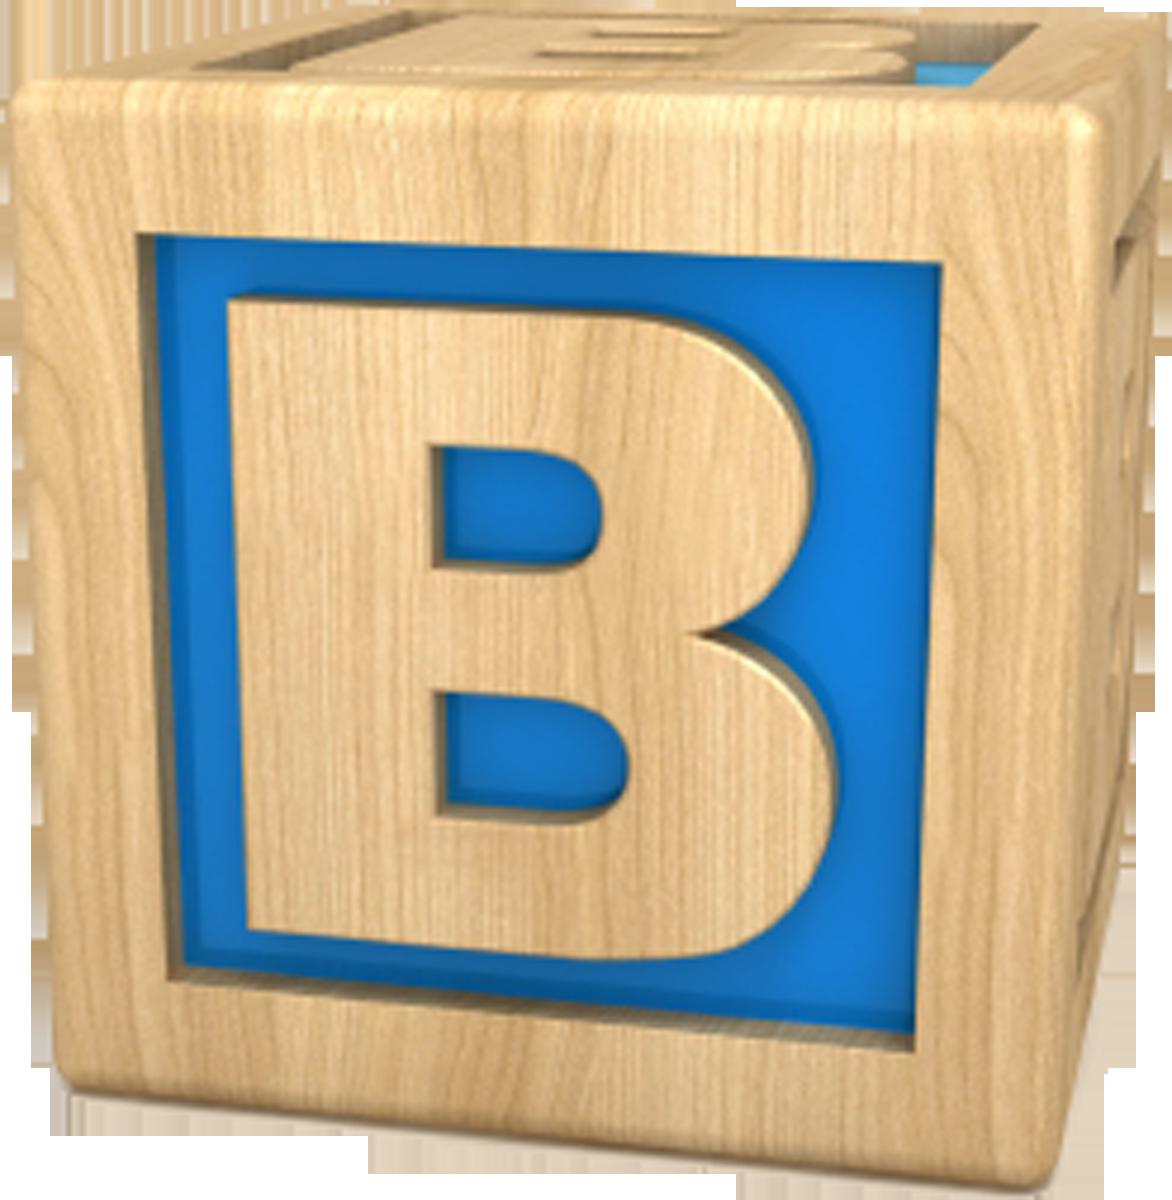 Buncee . B clipart letter blocks